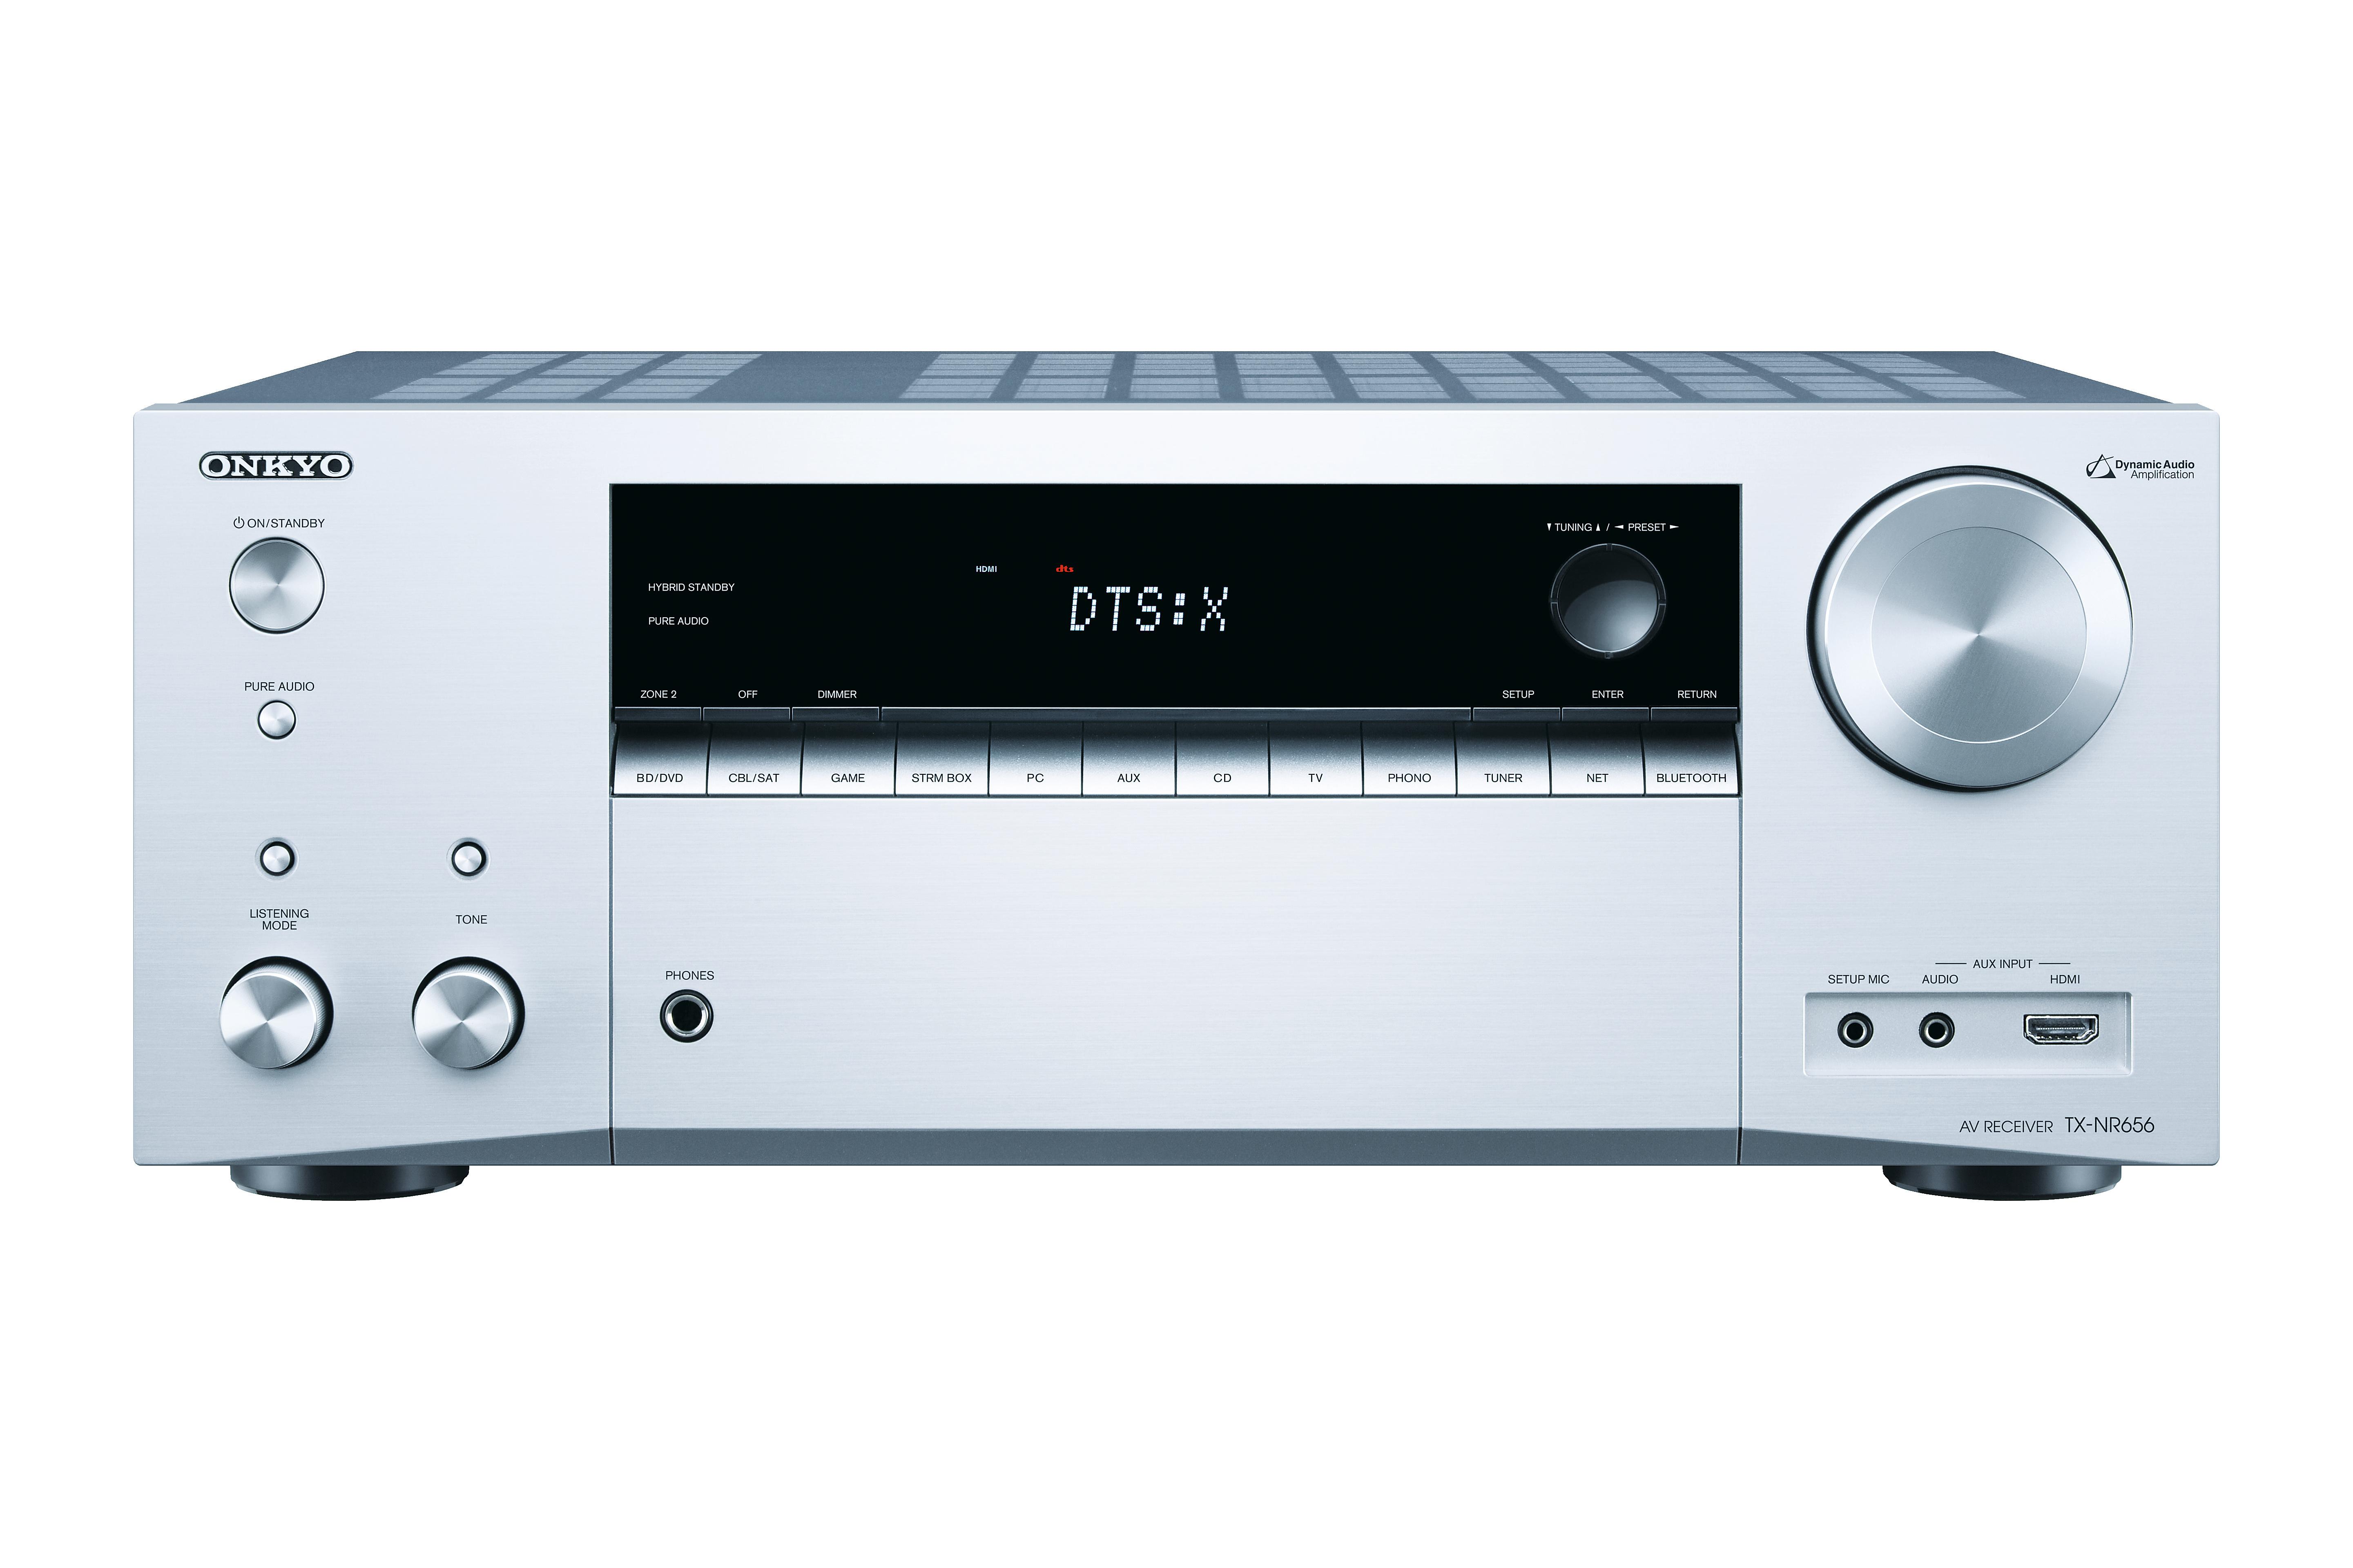 TX-NR656 Sl